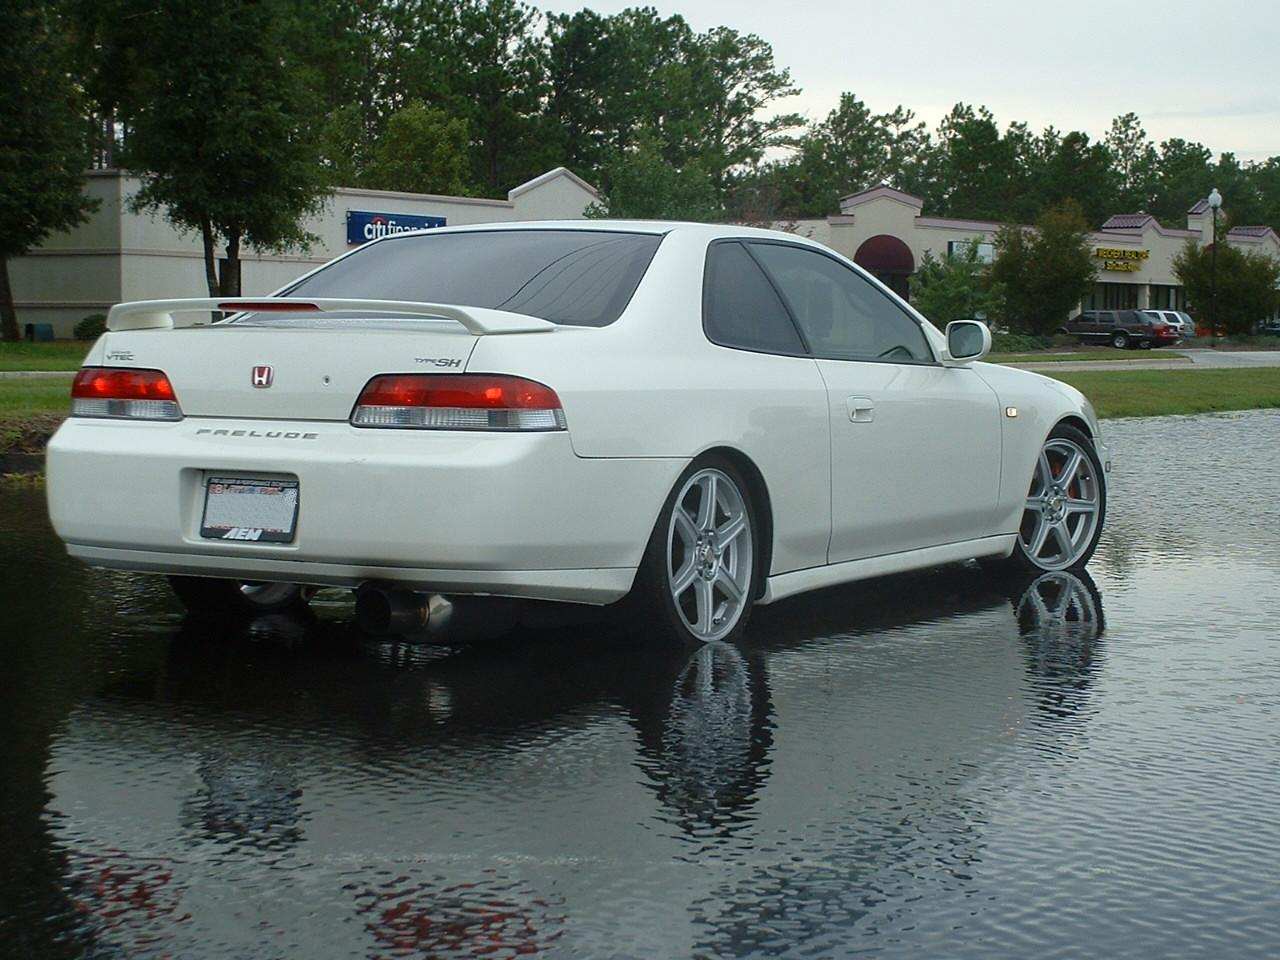 Honda Prelude SH